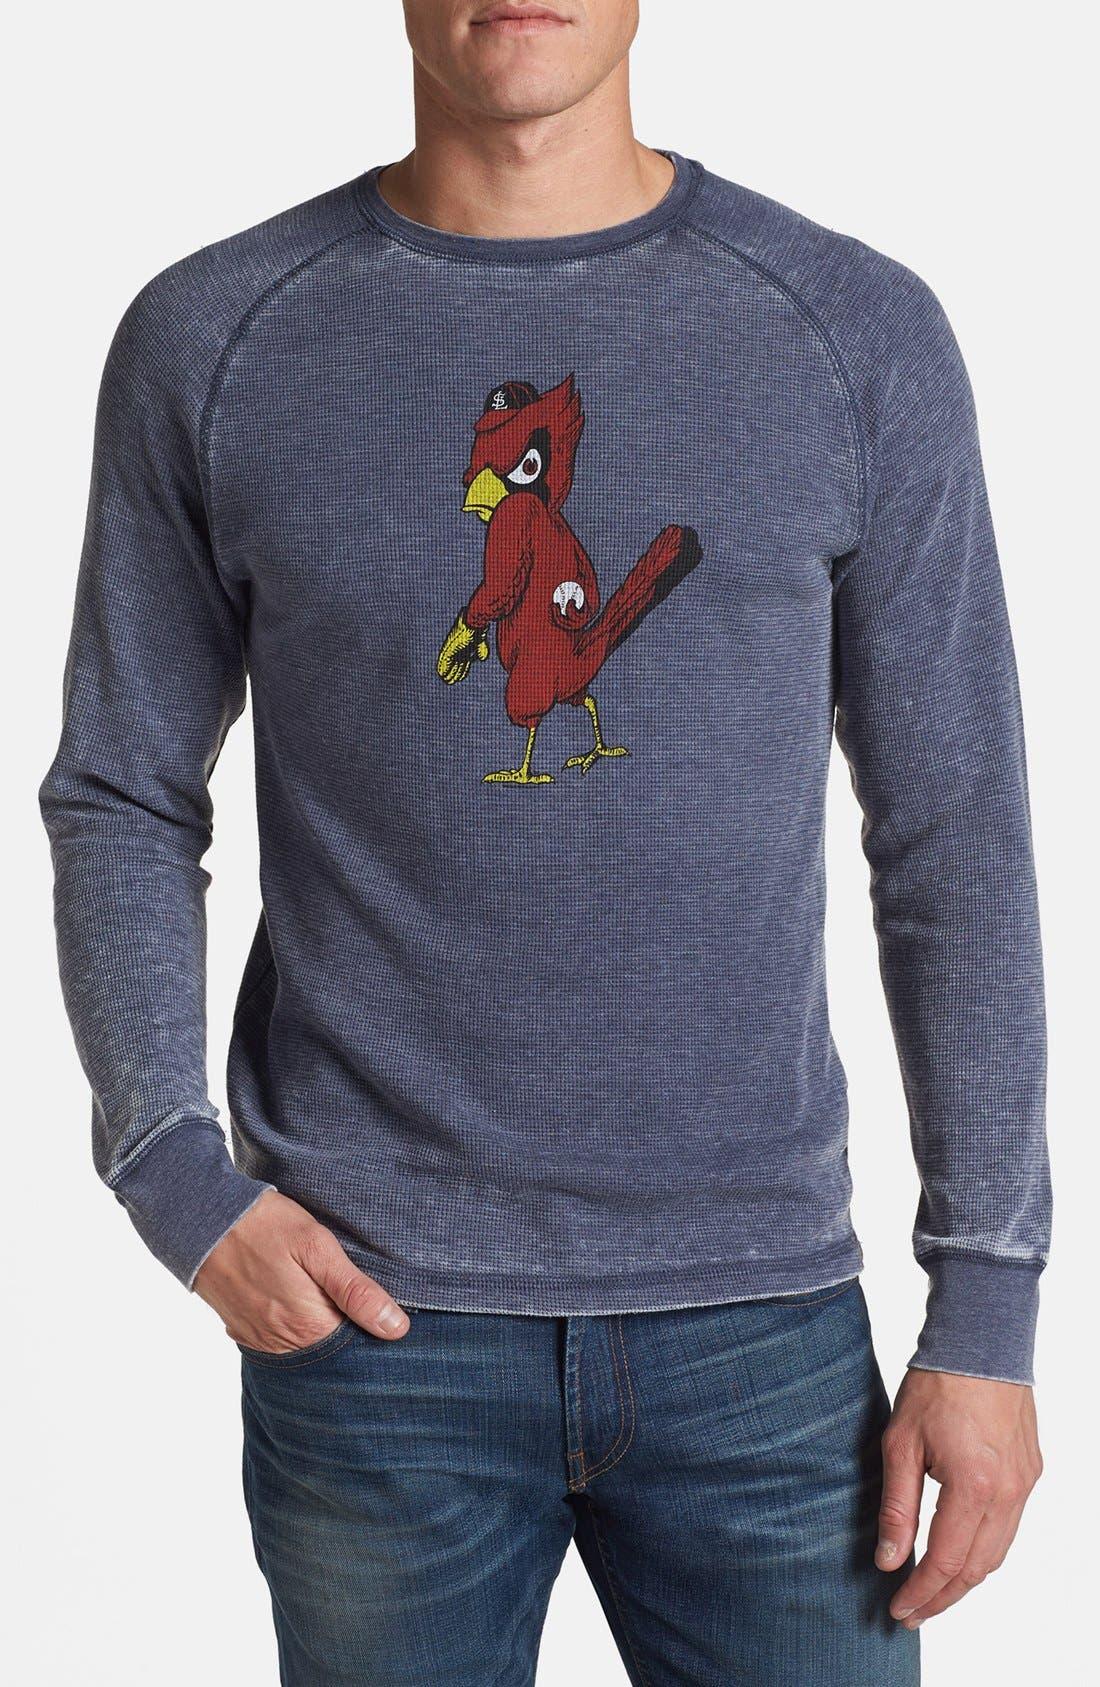 Alternate Image 1 Selected - Red Jacket 'Cardinals - Thermal Burn' Long Sleeve T-Shirt